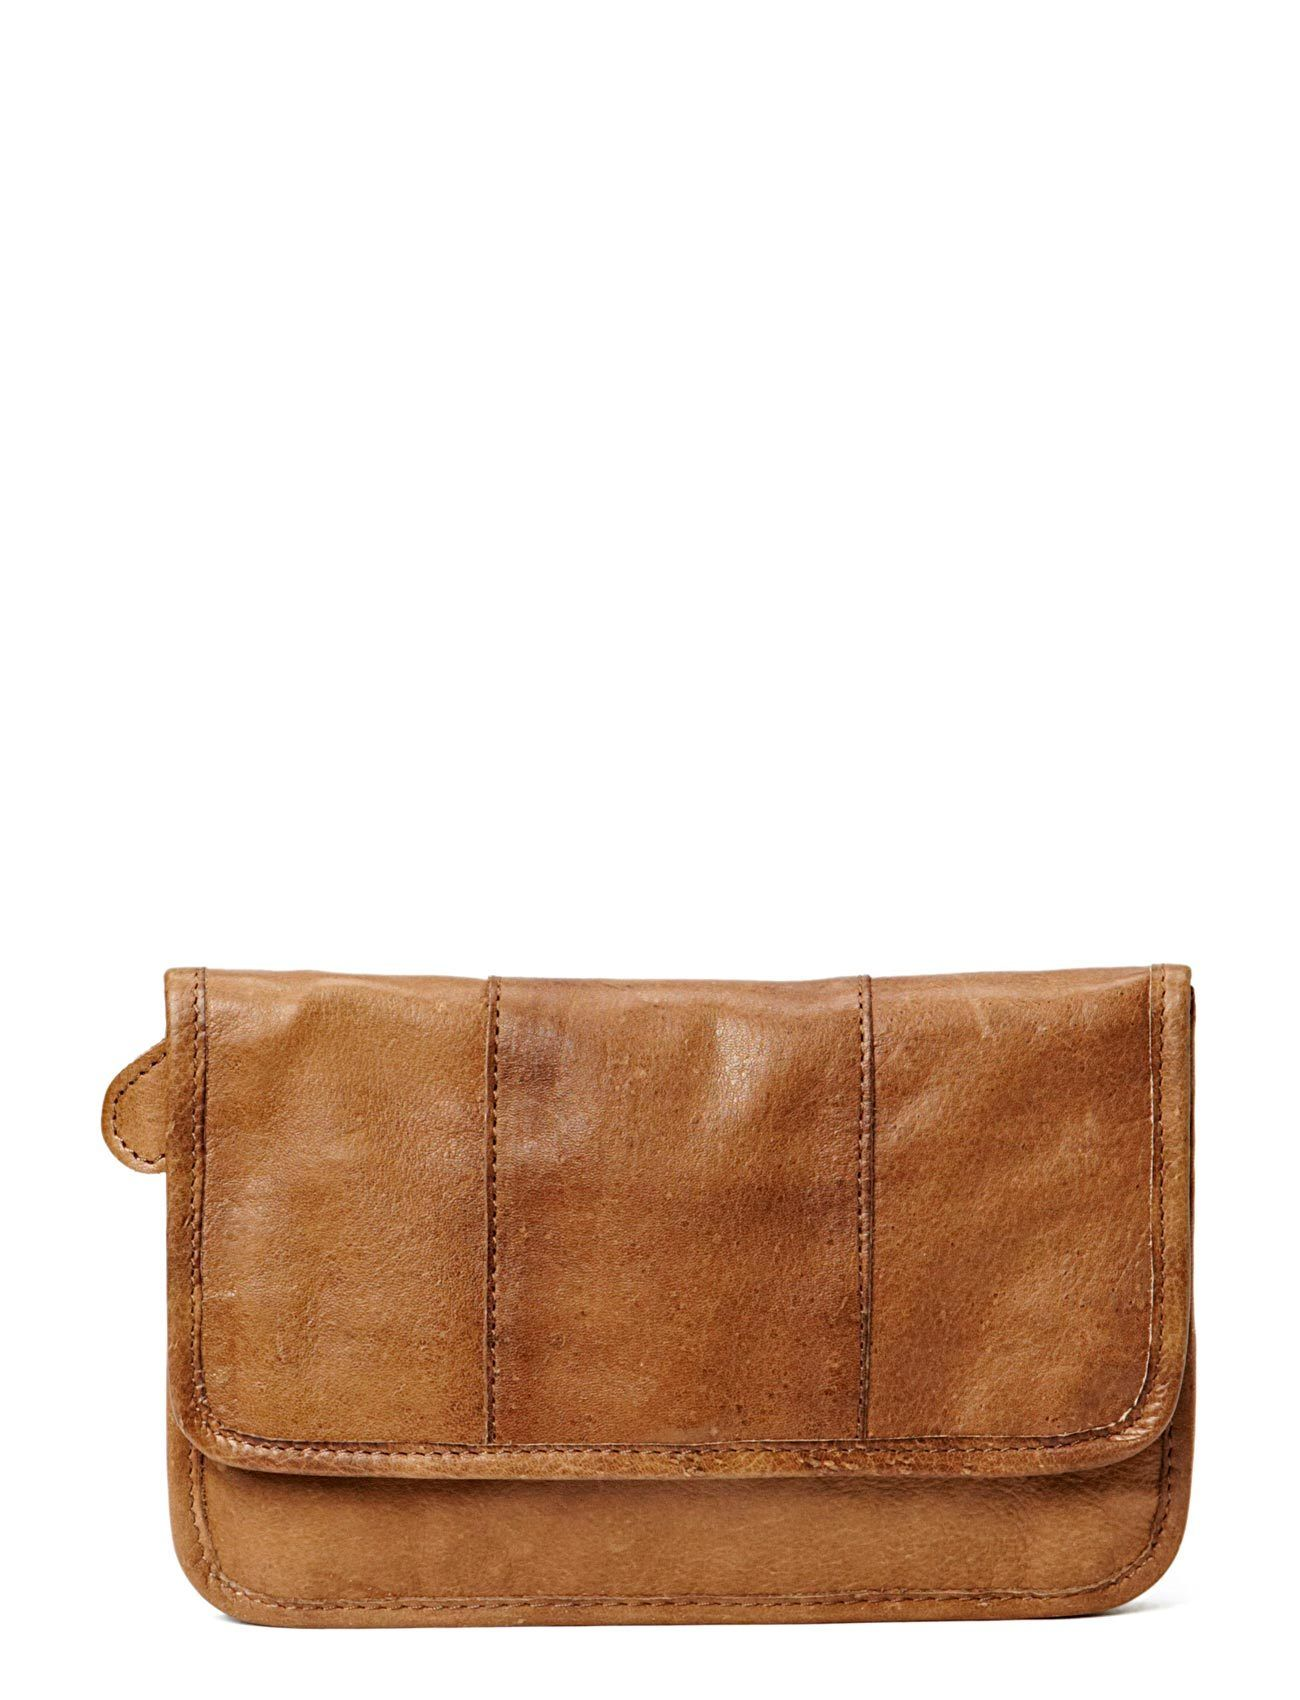 By Burin - Mallory purse box